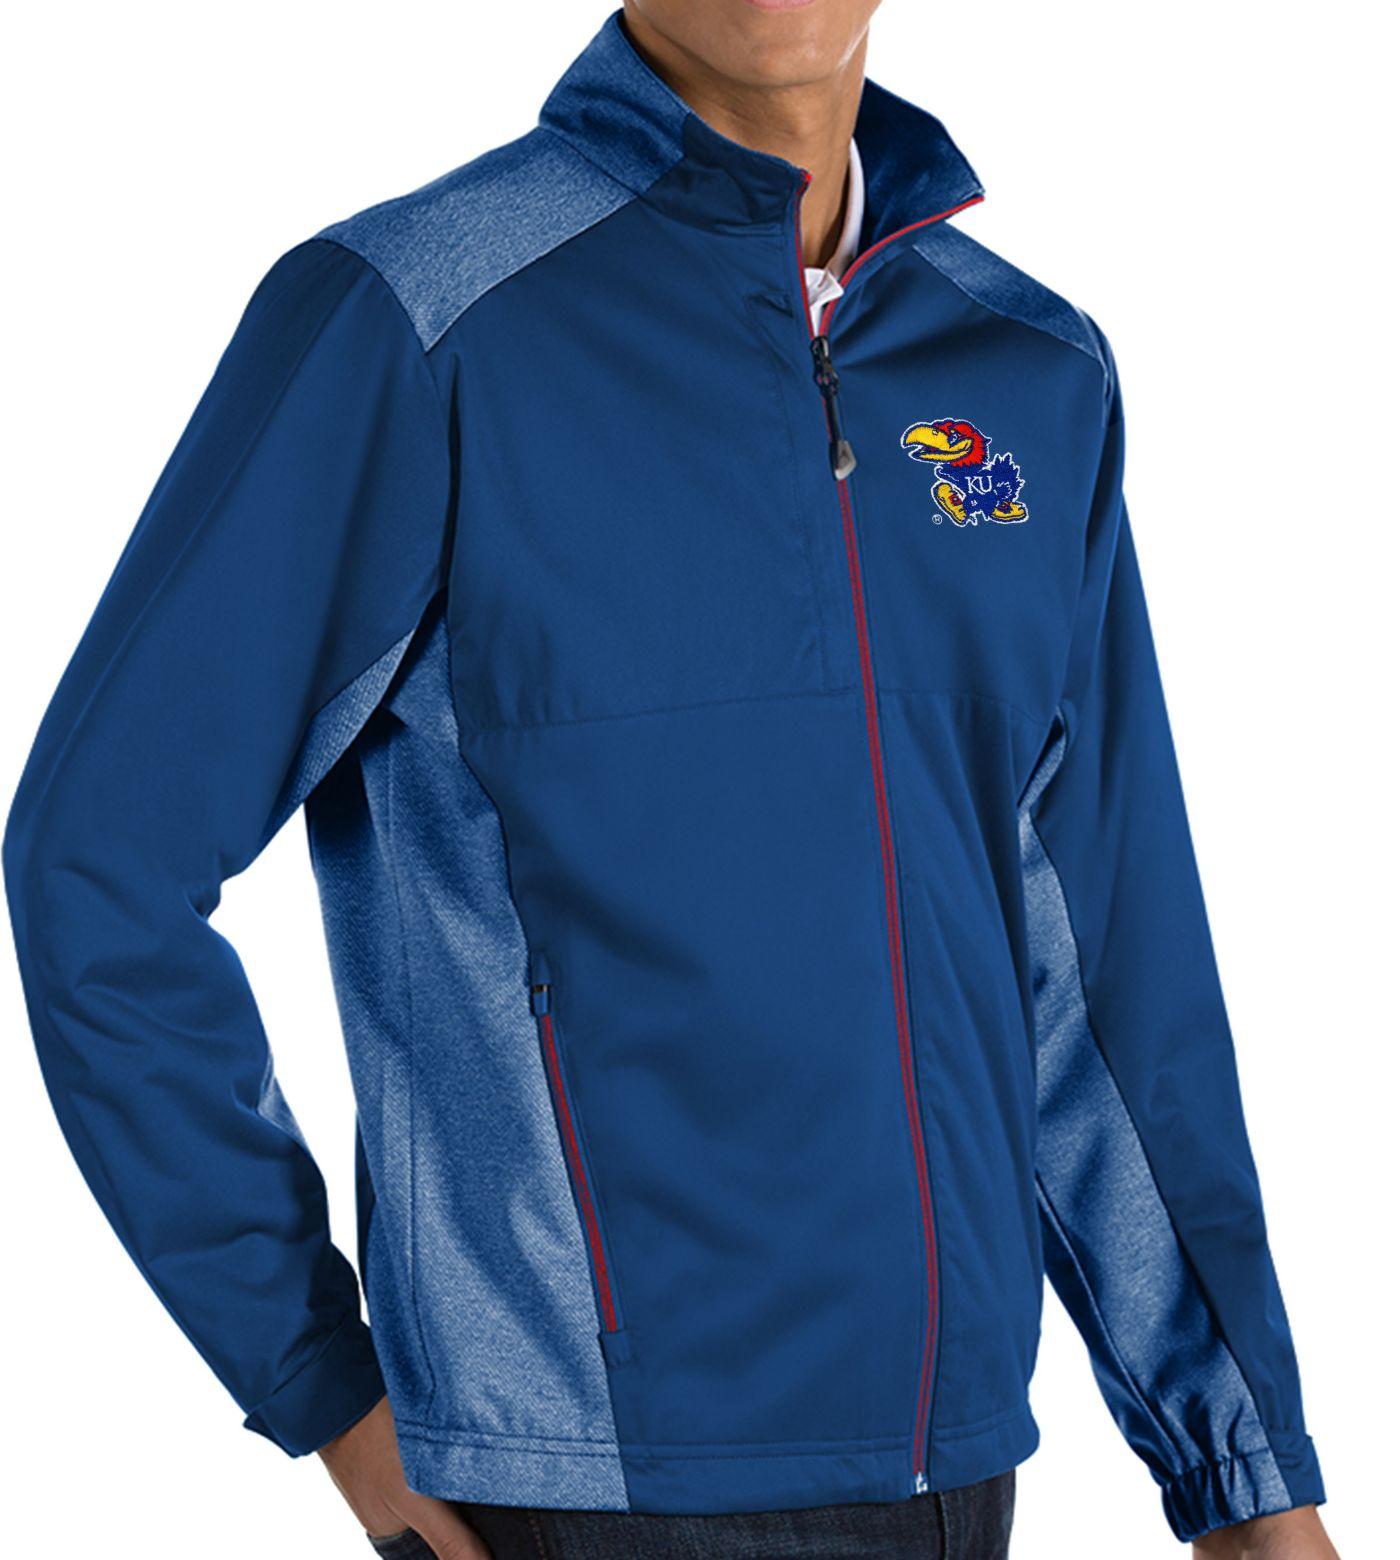 Antigua Men's Kansas Jayhawks Blue Revolve Full-Zip Jacket